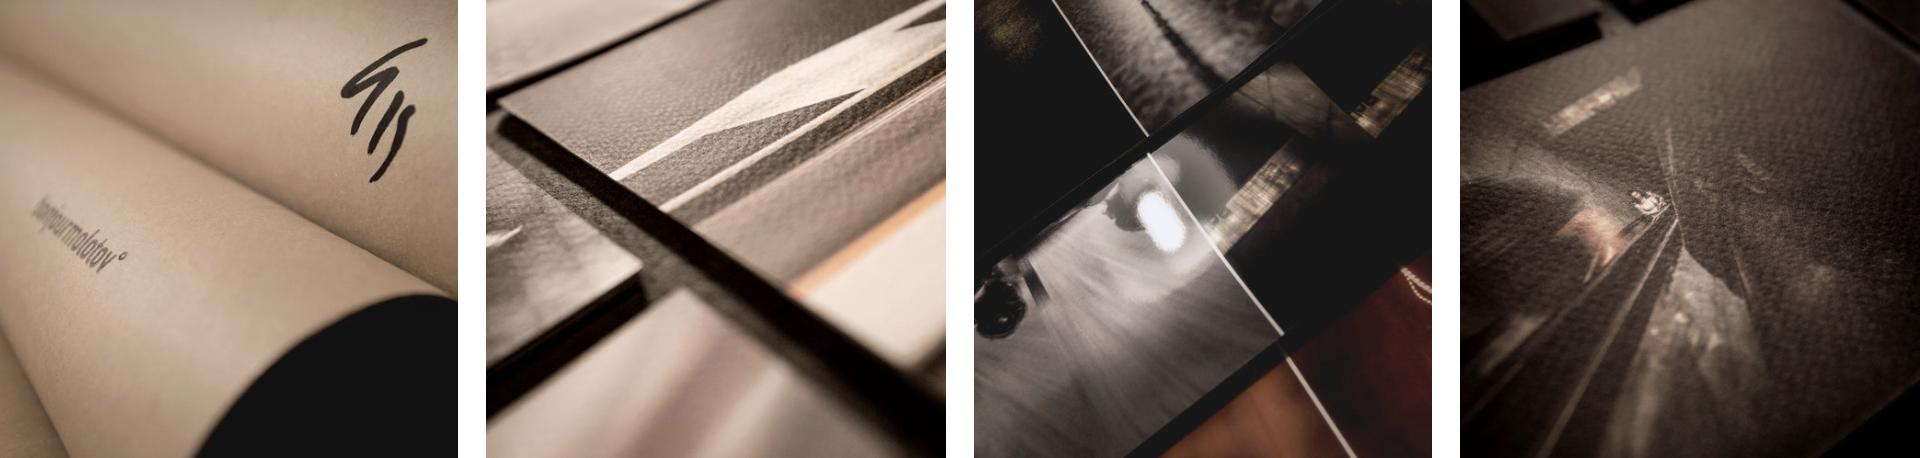 In Transit bonjourmolotov Andre Gigante Photography Experimenta Design 16B.png